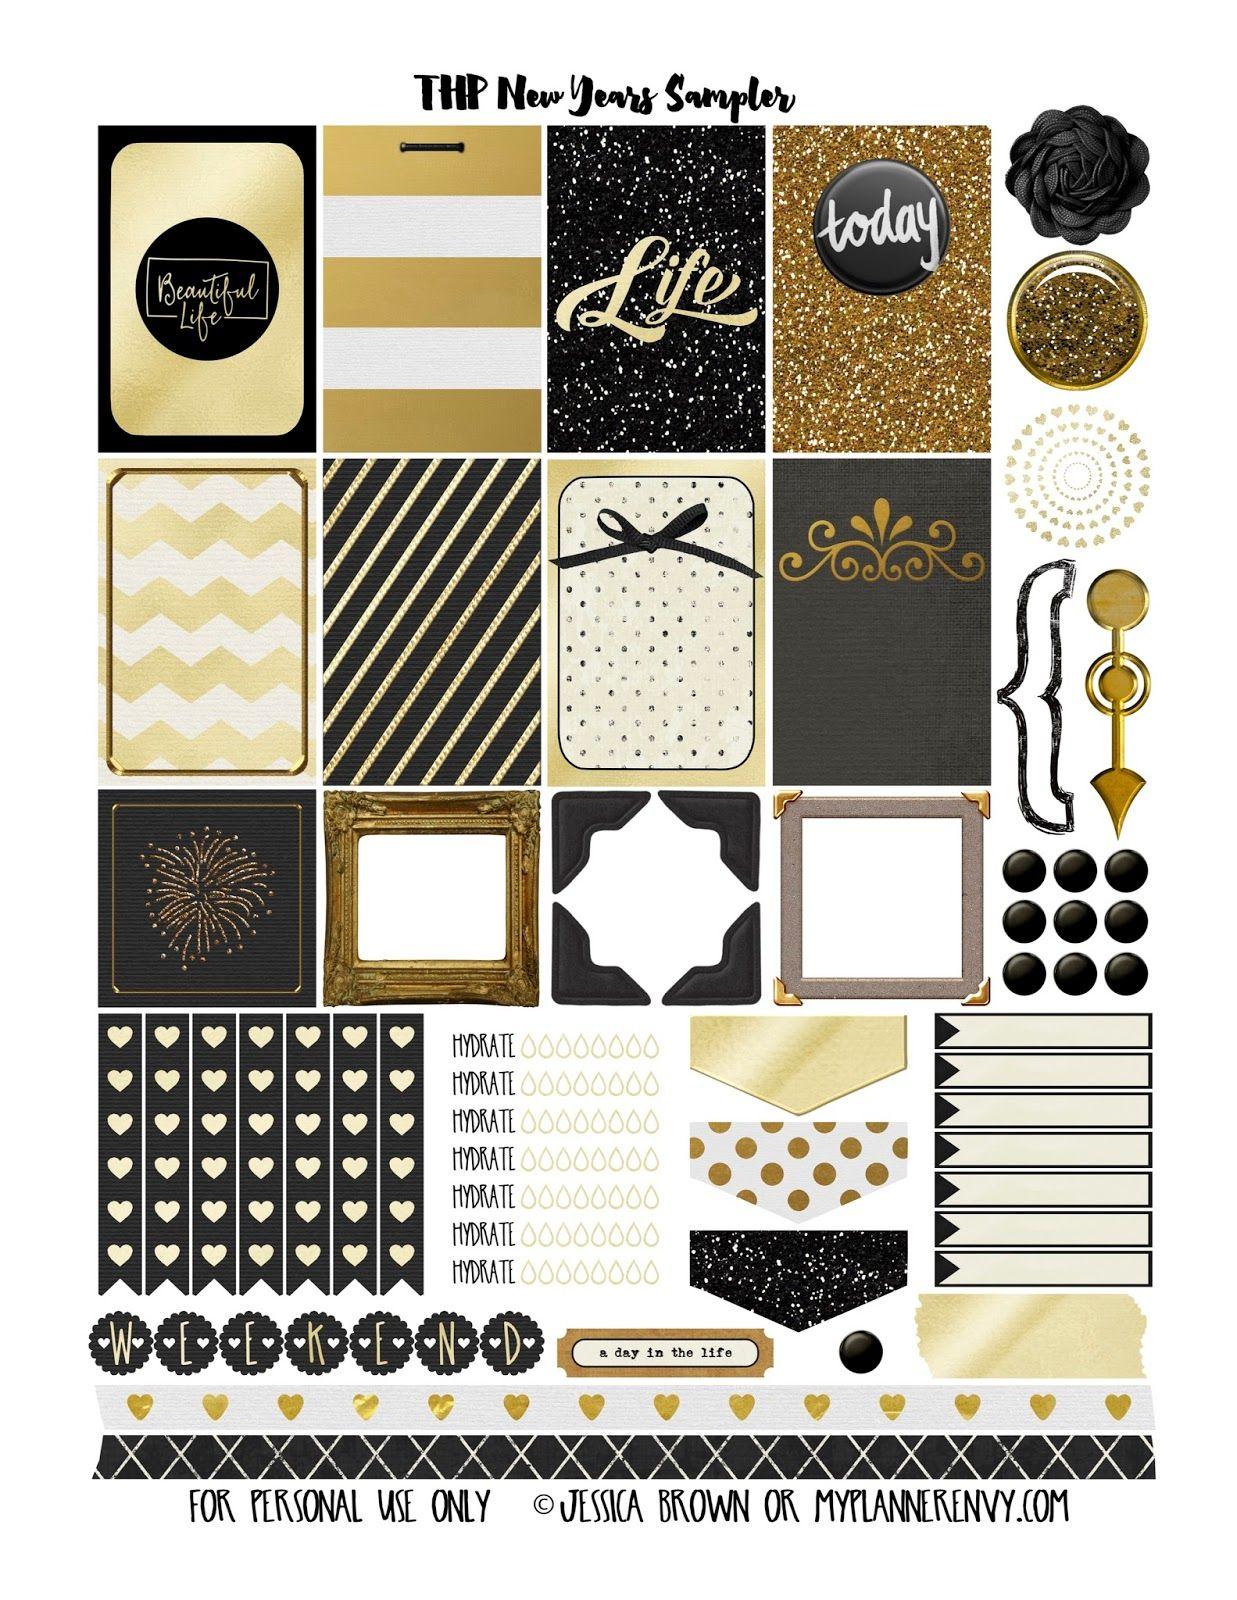 My planner envy new years sampler free planner printable graphics pinterest free for Pinterest printables